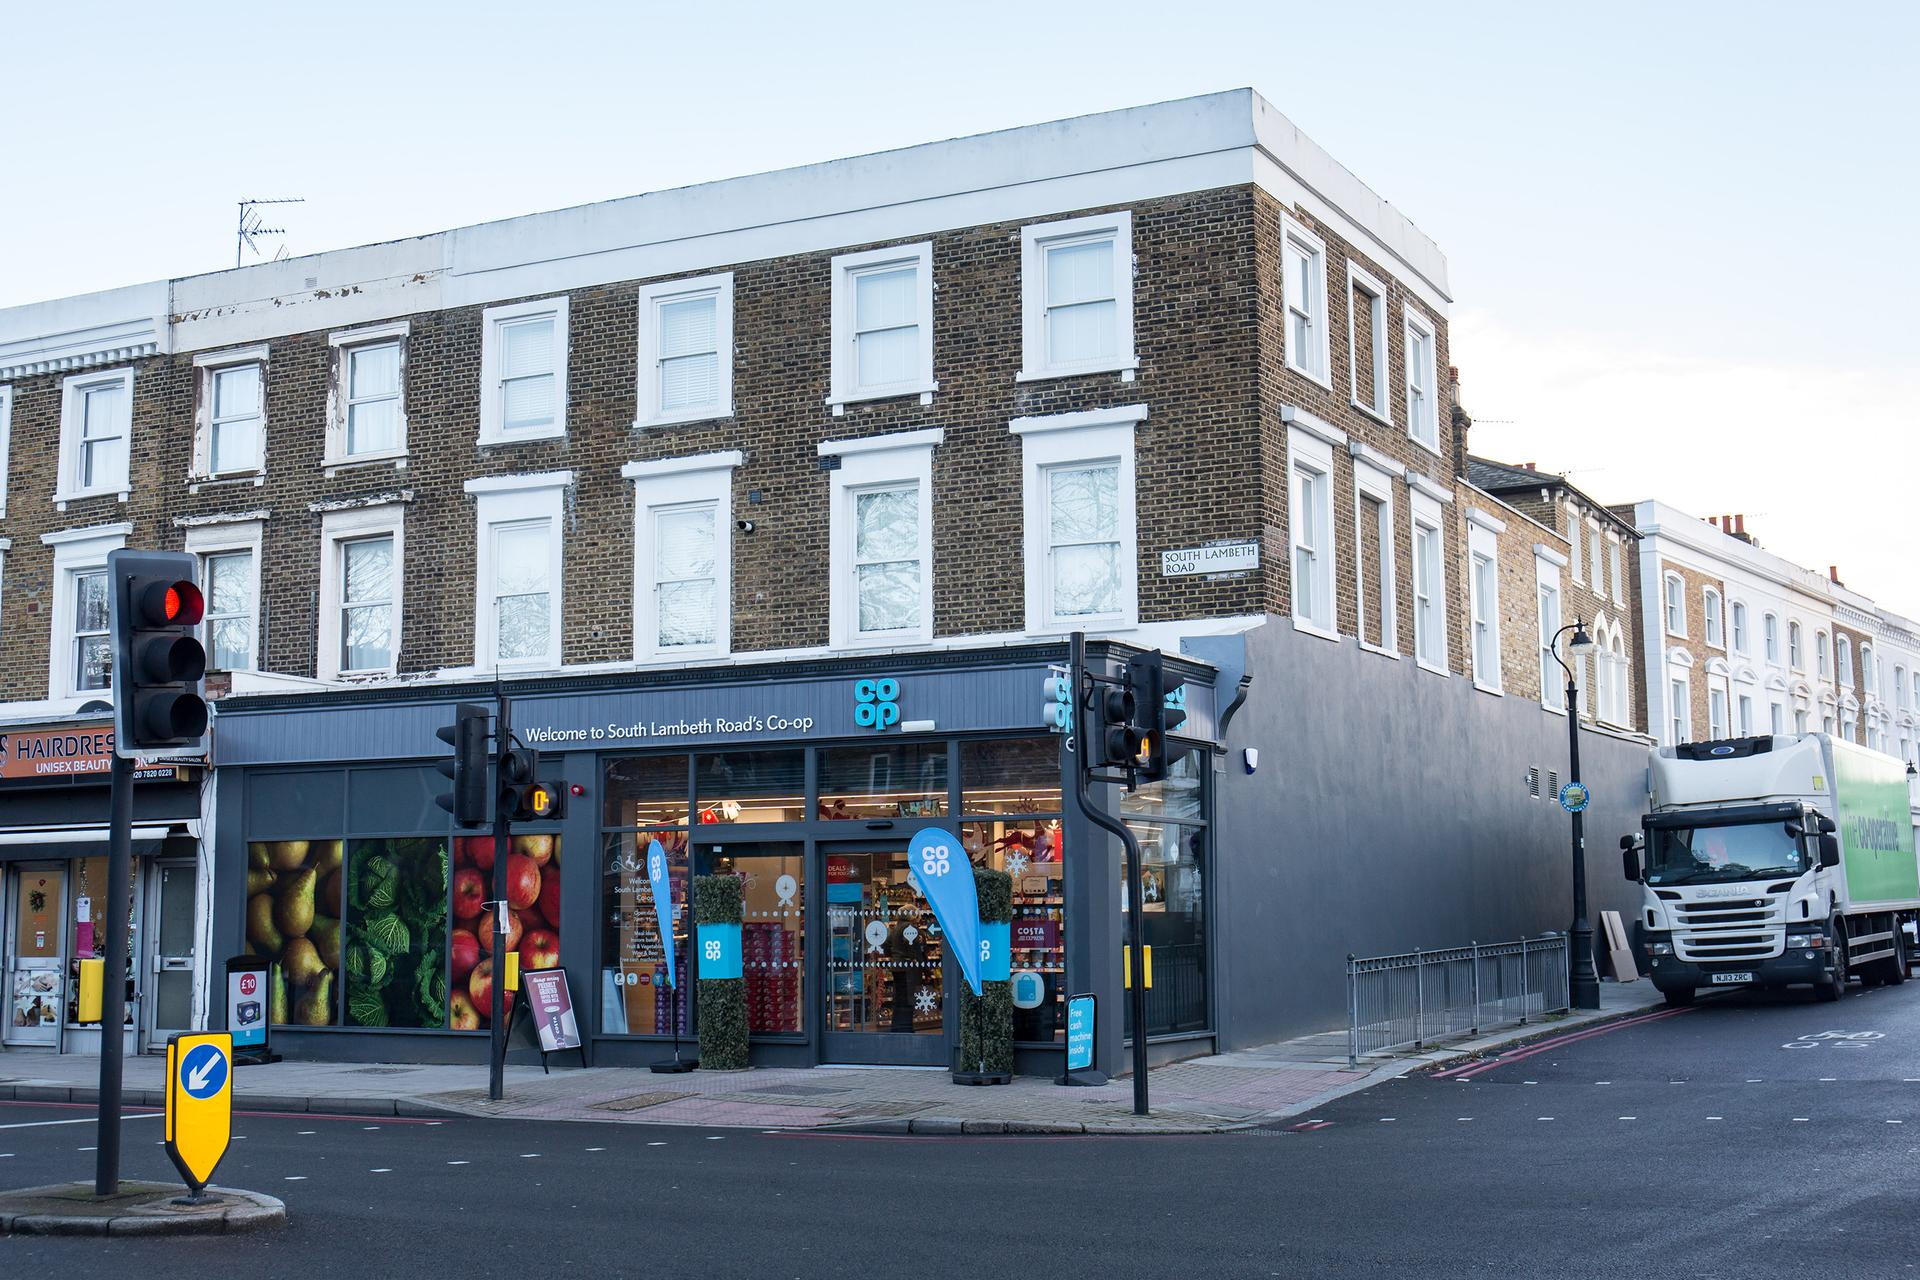 A photograph of London - South Lambeth Road